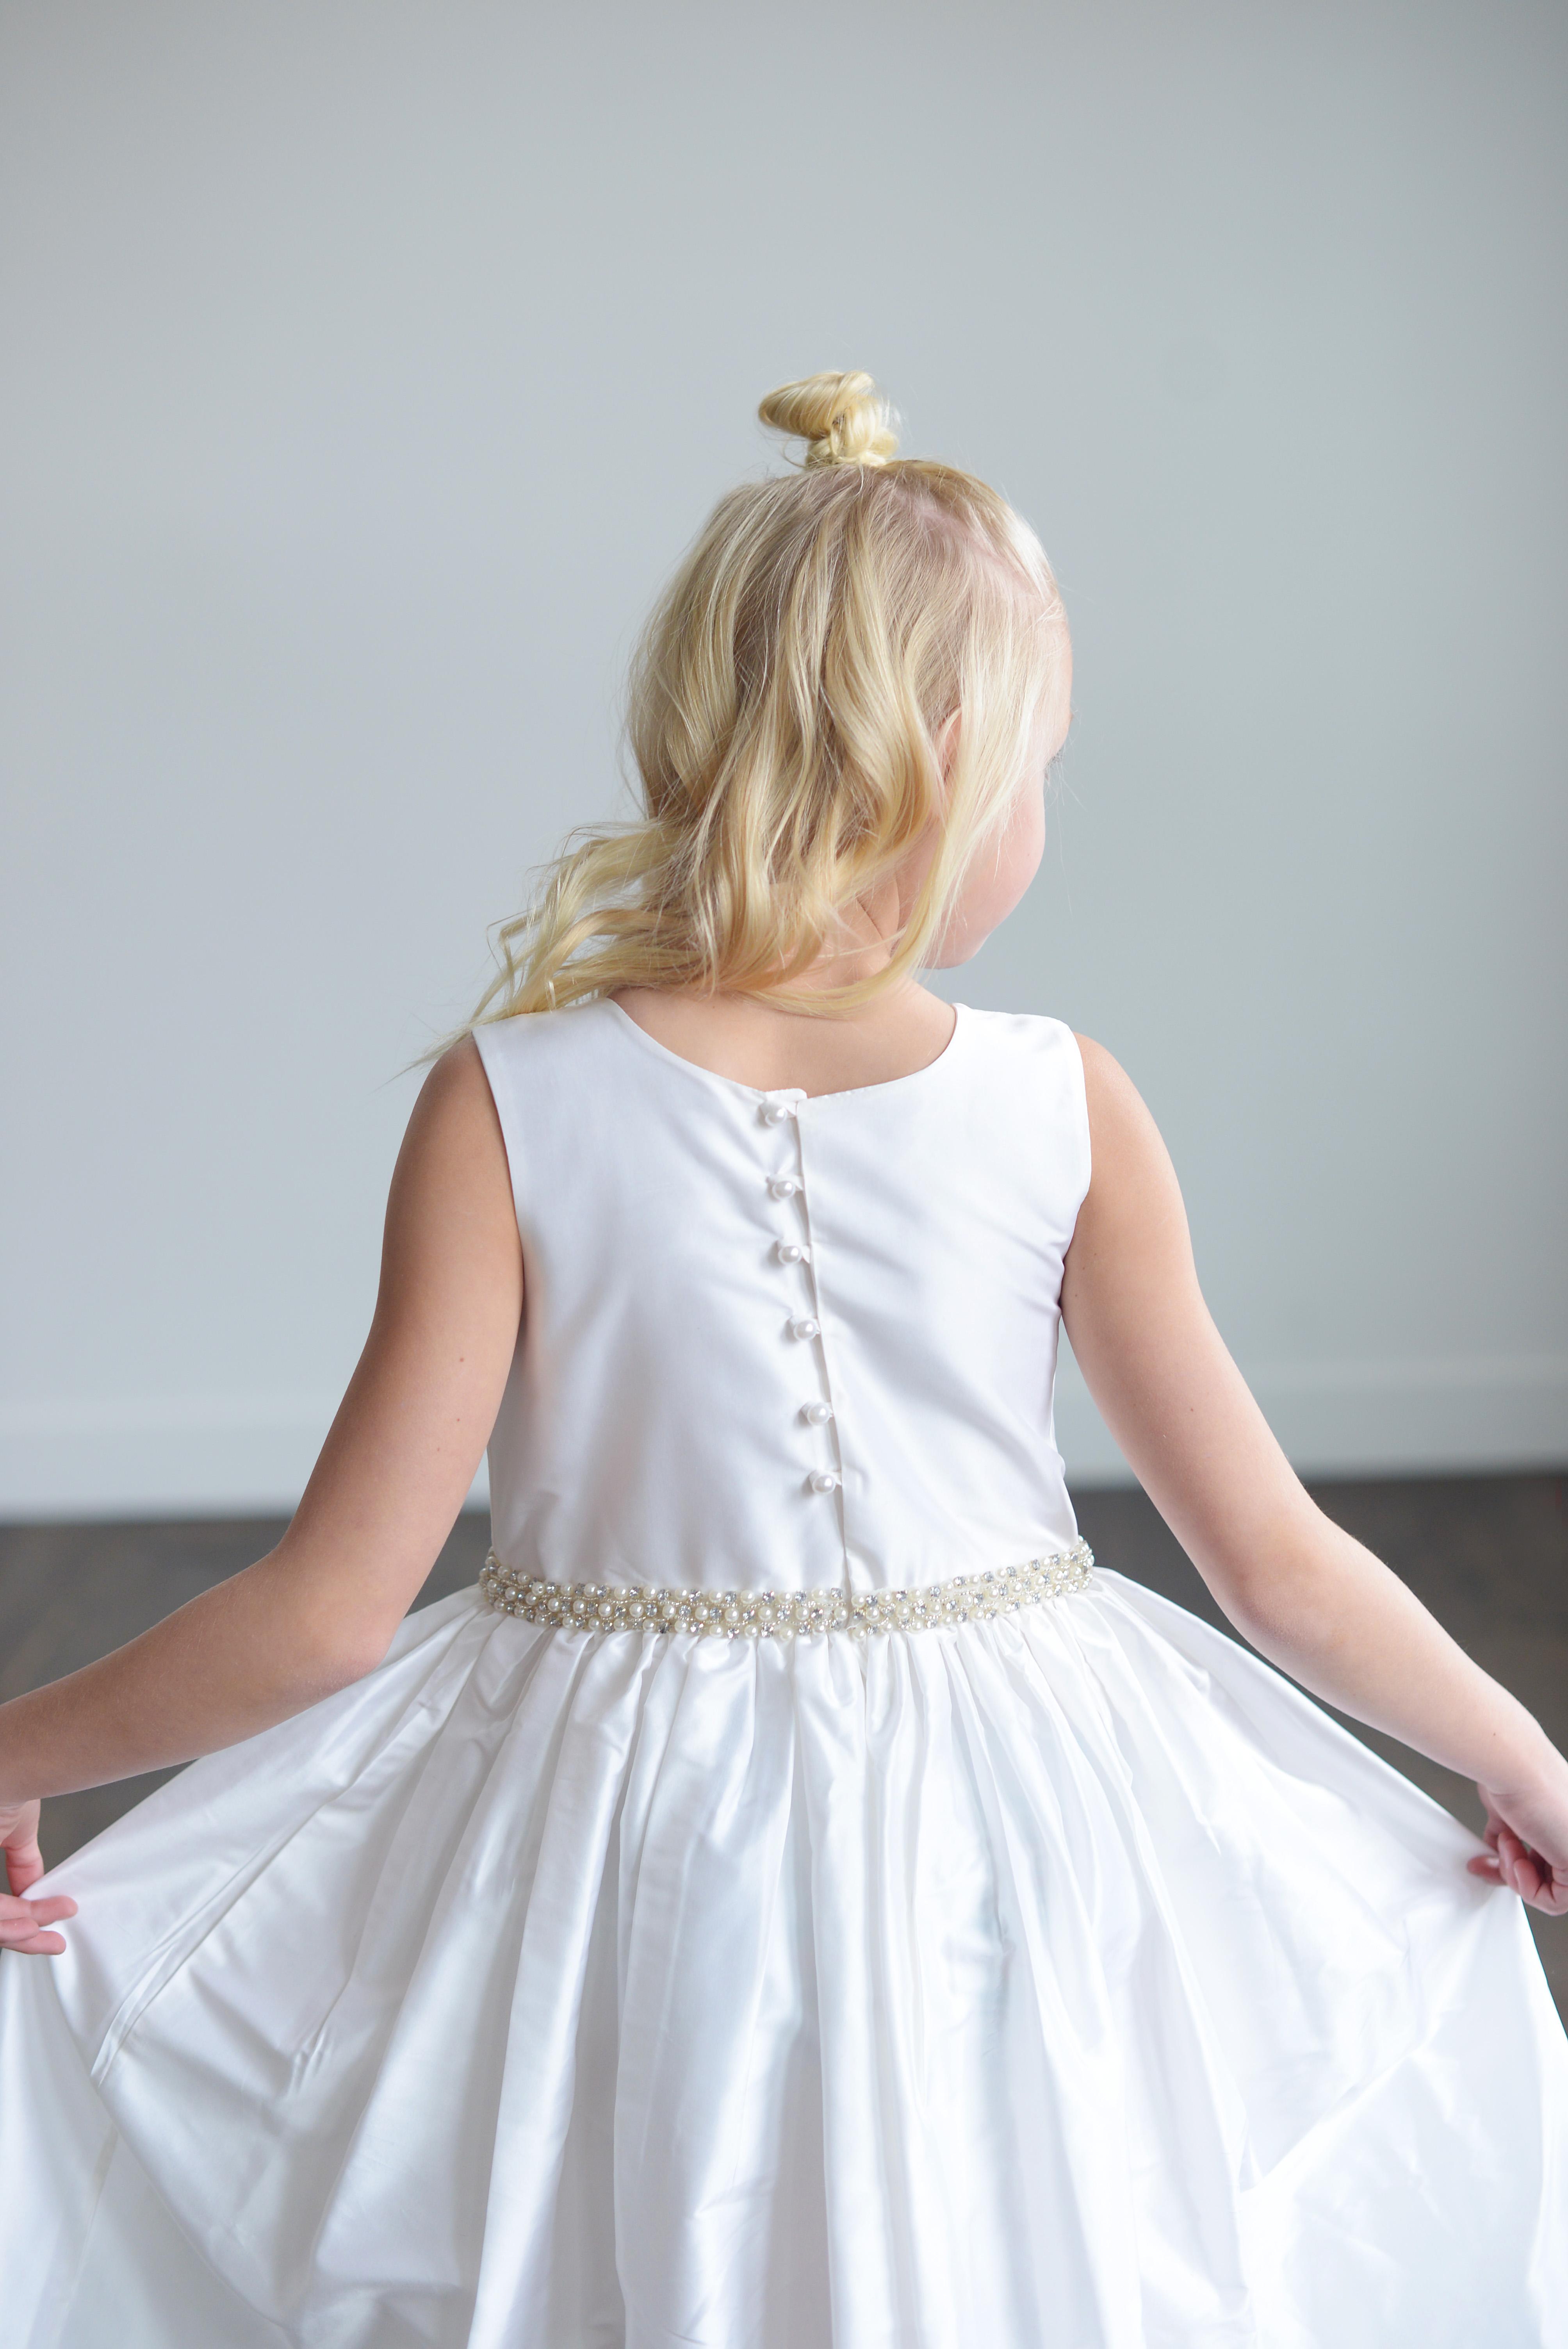 805b7cc7e60 See our bespoke handmade flower girl dresses and beautiful communion ...